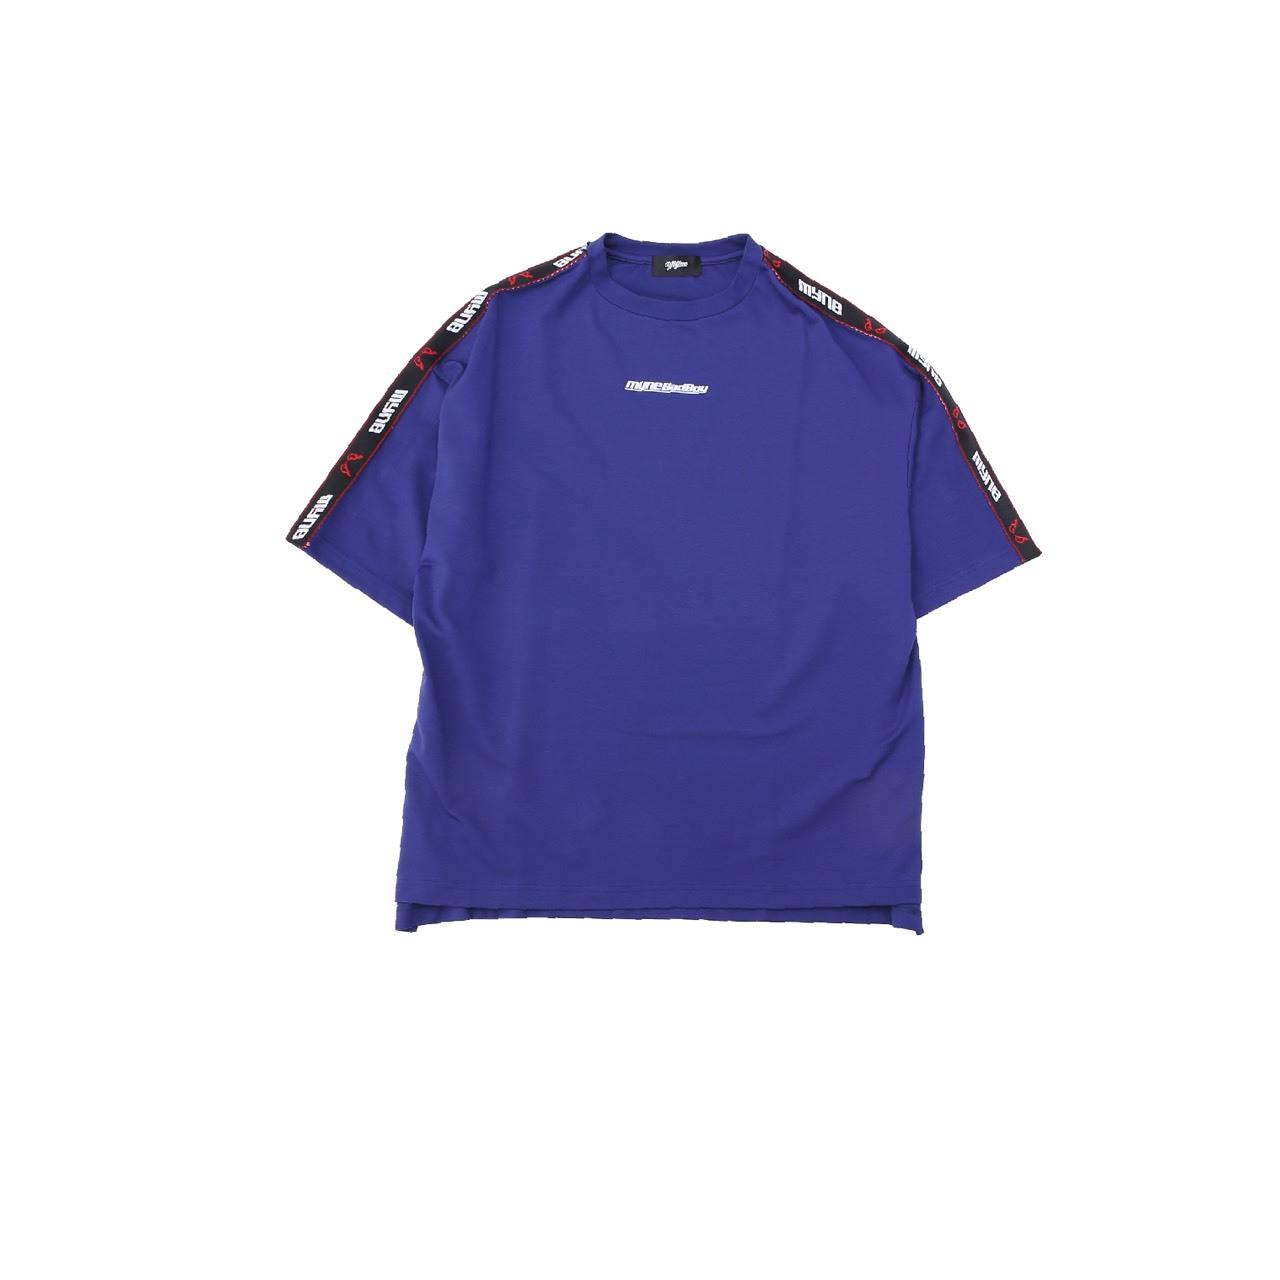 【10%OFF】MYne × BADBOY T-shirt / BLUE - 画像1